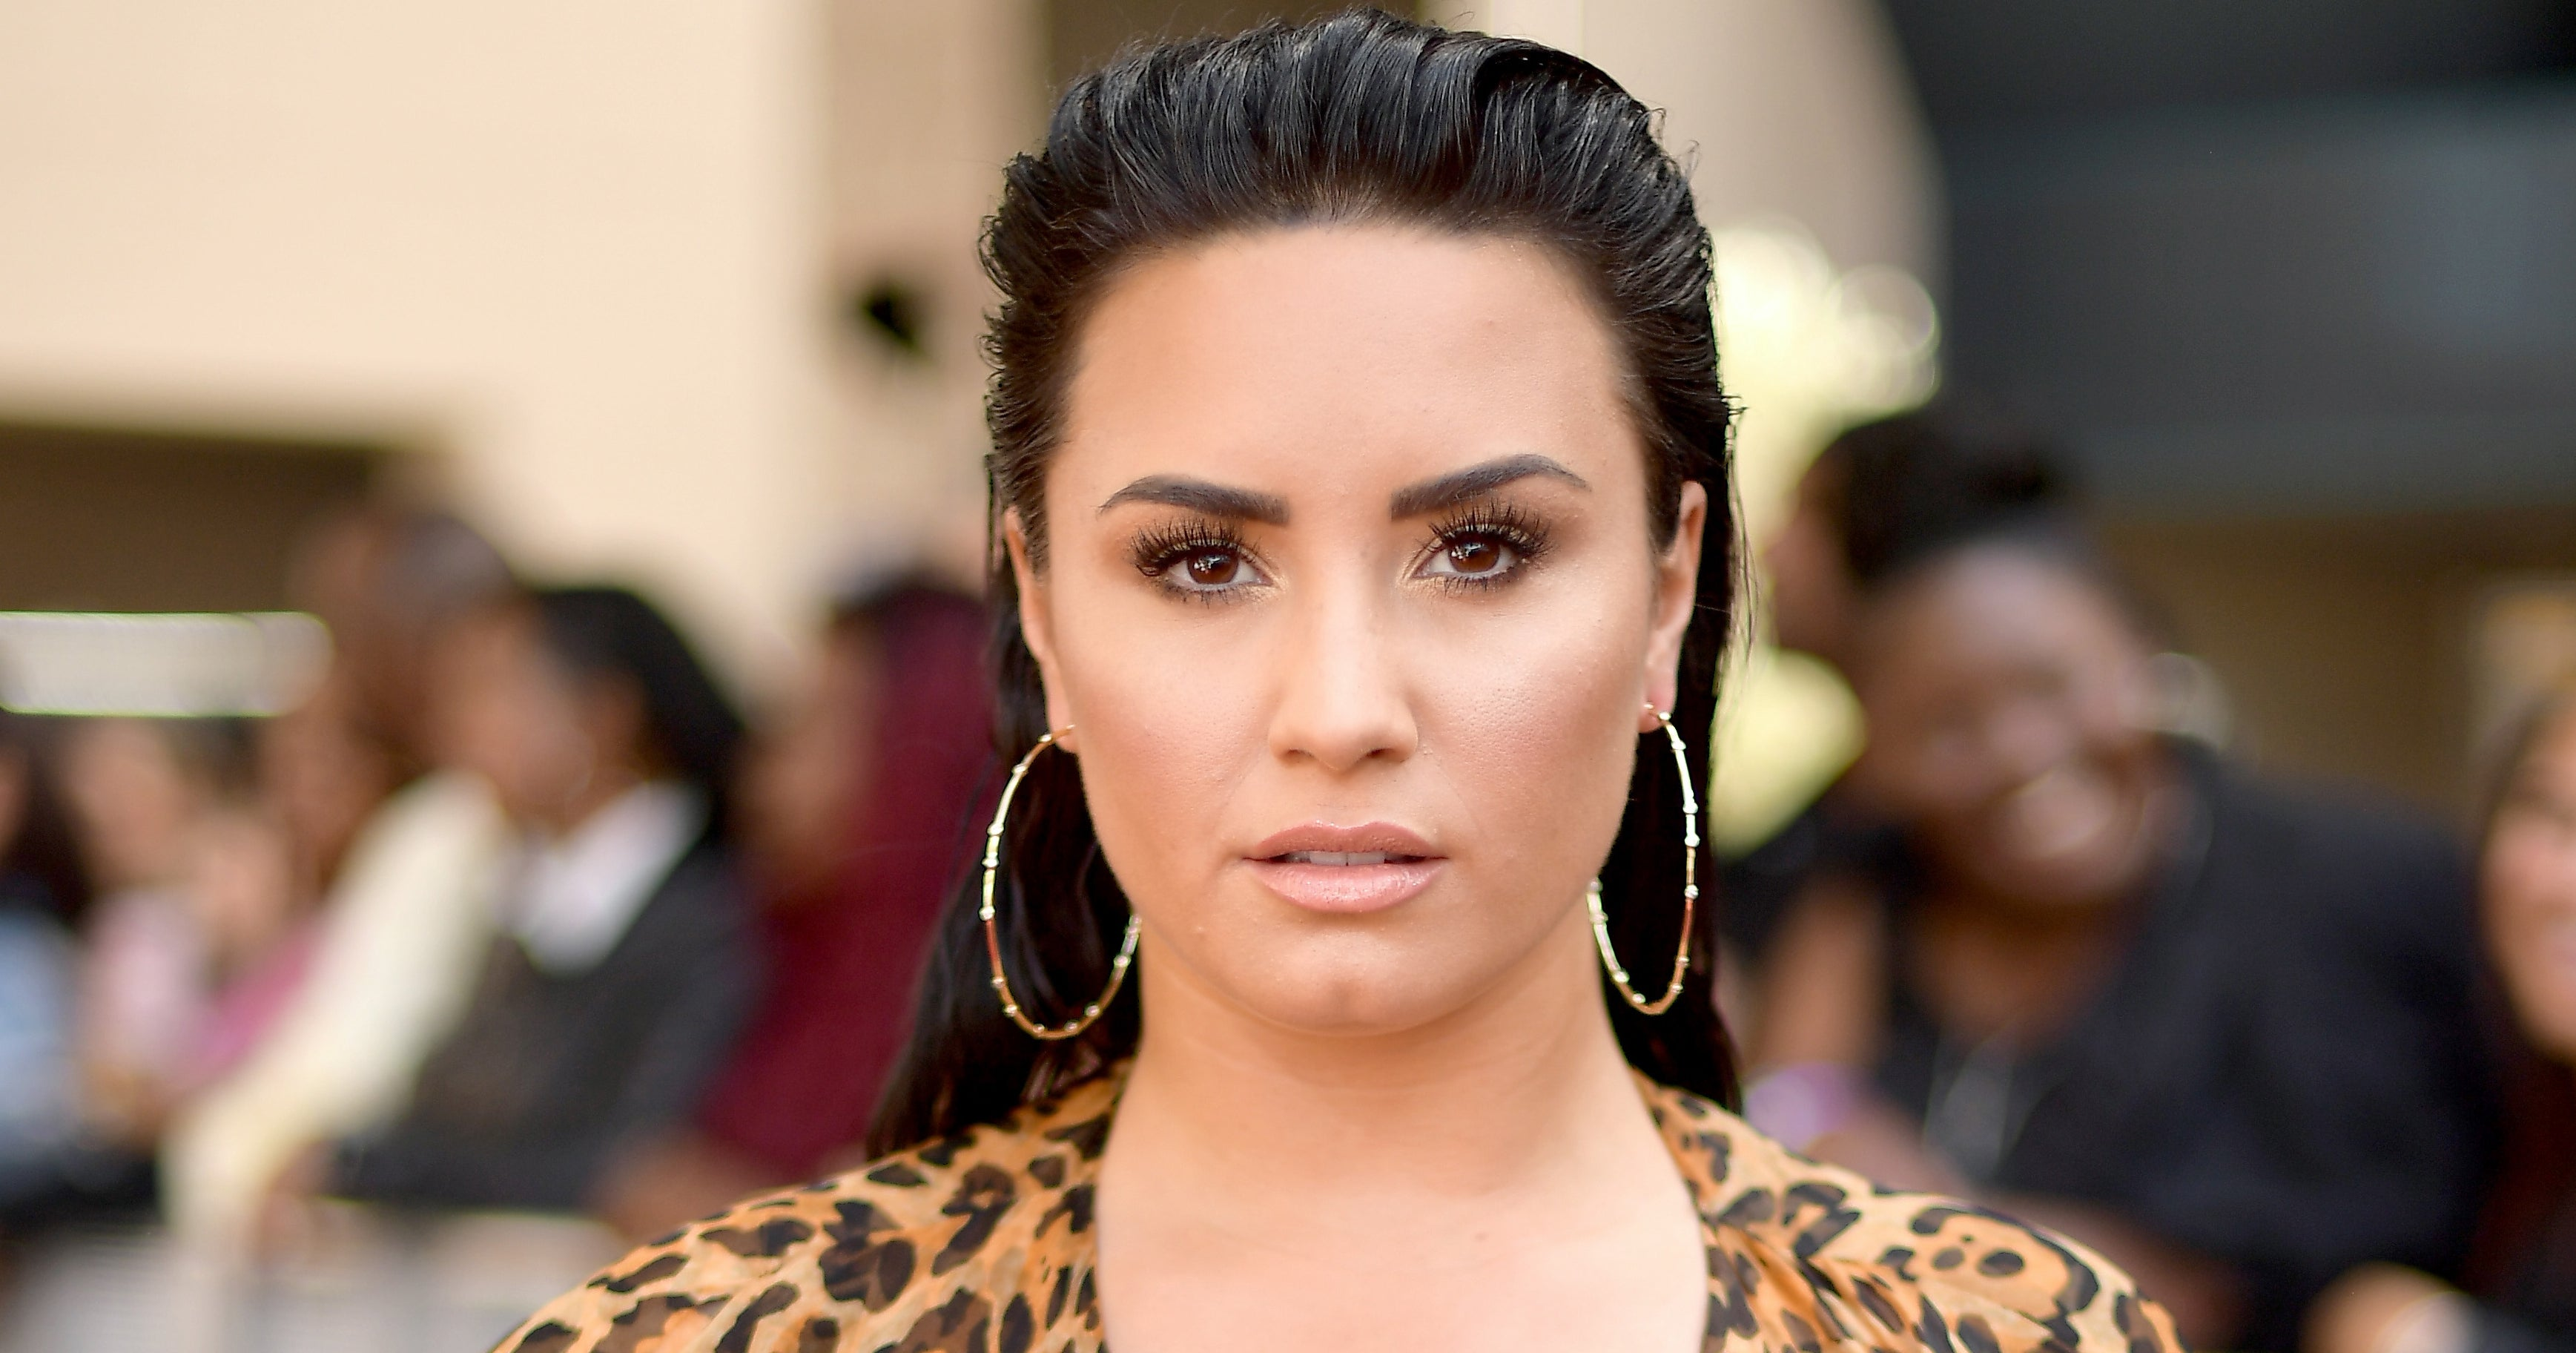 www.refinery29.com: Demi Lovato Just Low-Key Flashed Her Nipple Piercing